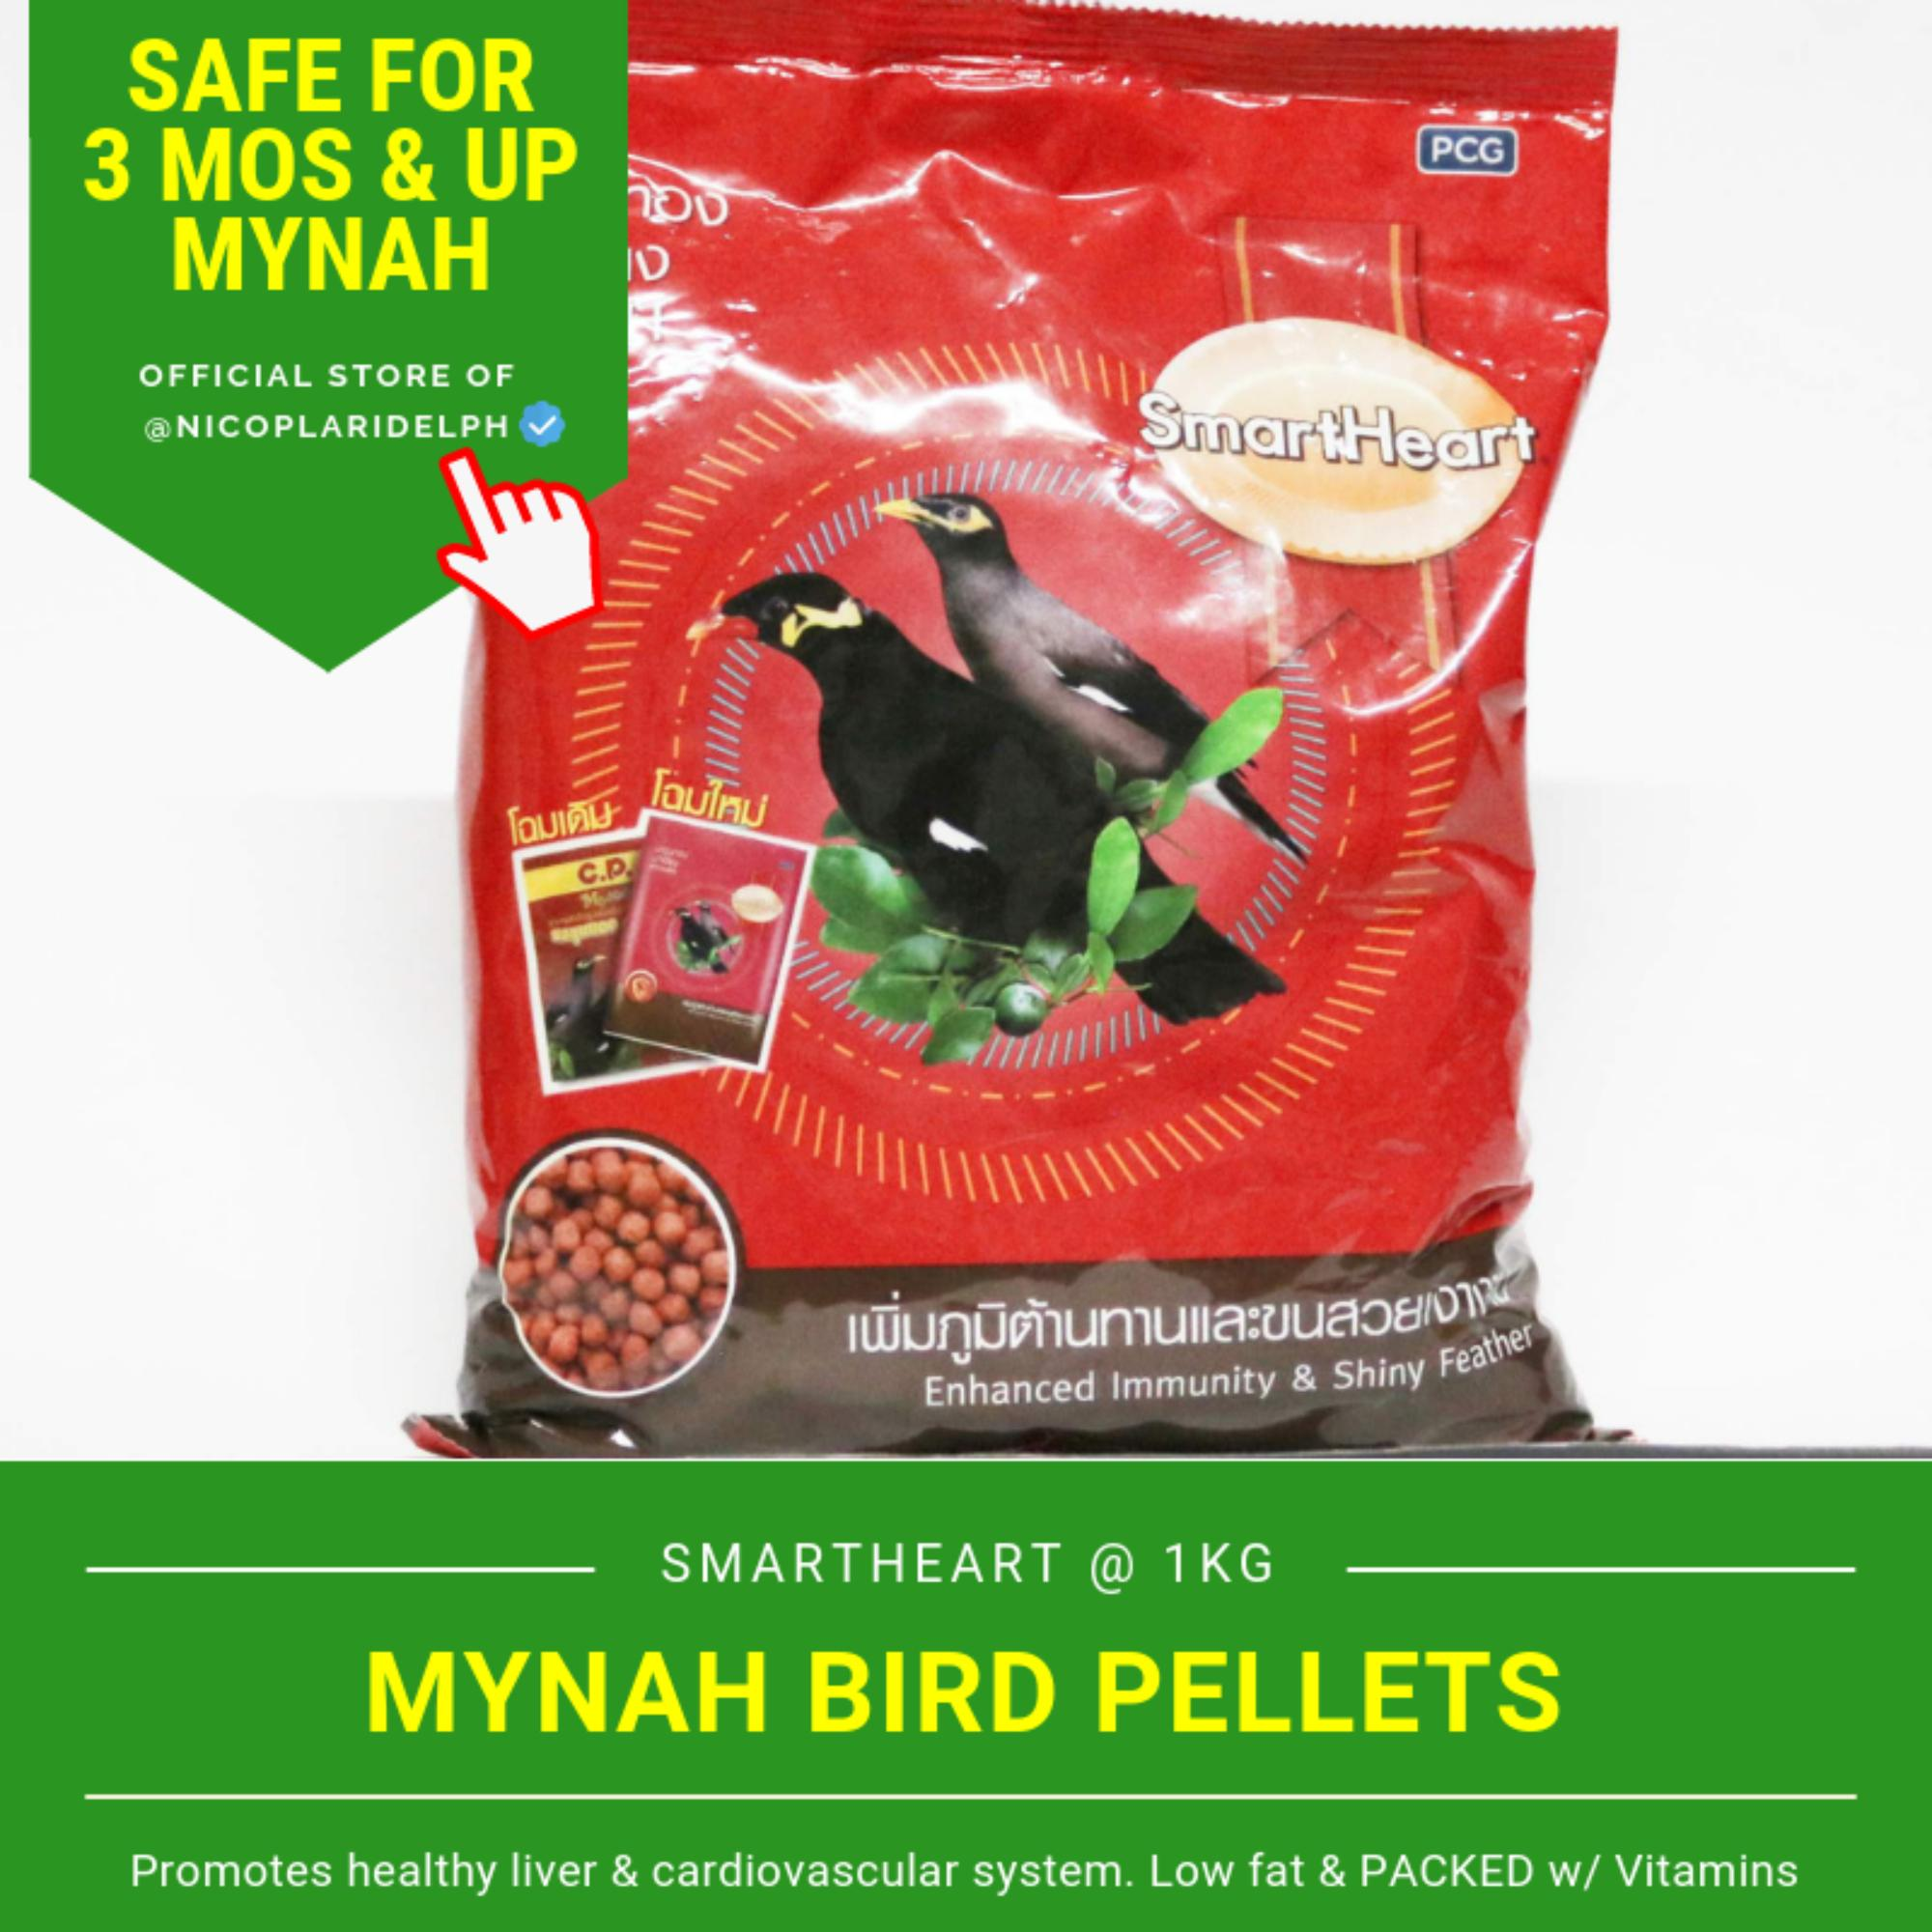 Smartheart Mynah Bird Food for Enhanced Immunity and Shiny Feathers (1kg)